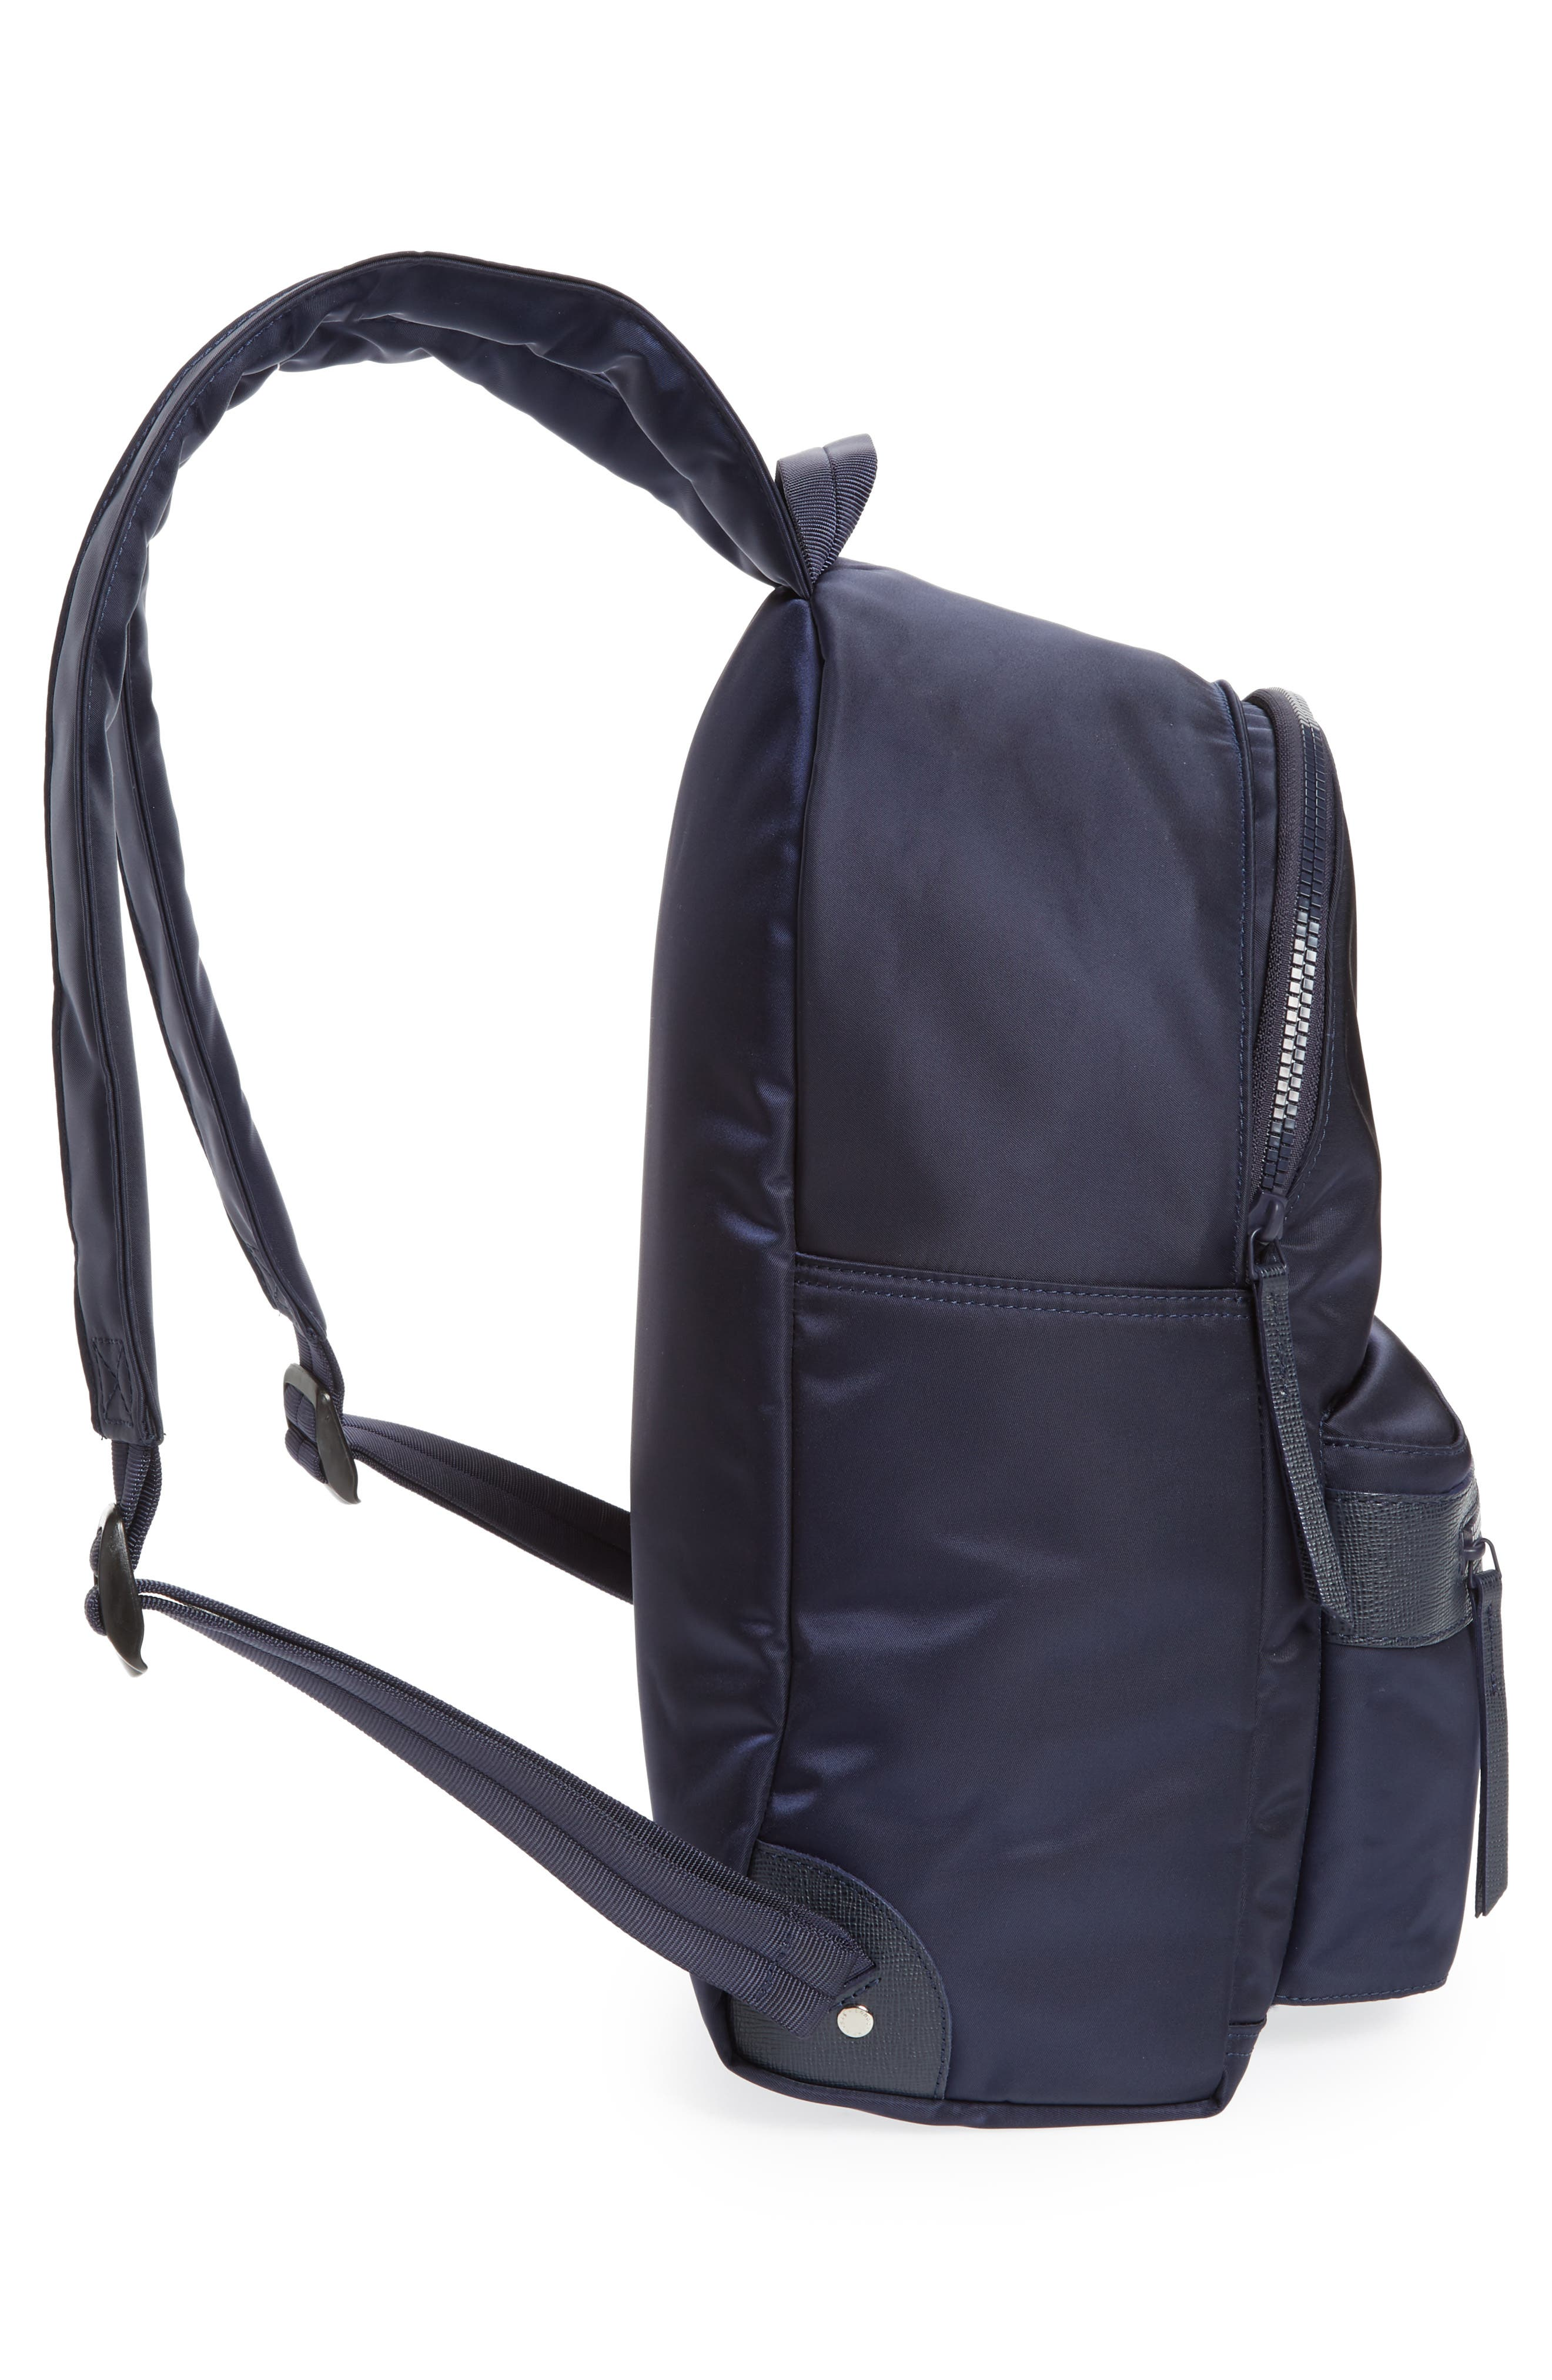 LONGCHAMP, 'Le Pliage Neo' Nylon Backpack, Alternate thumbnail 6, color, NAVY BLUE